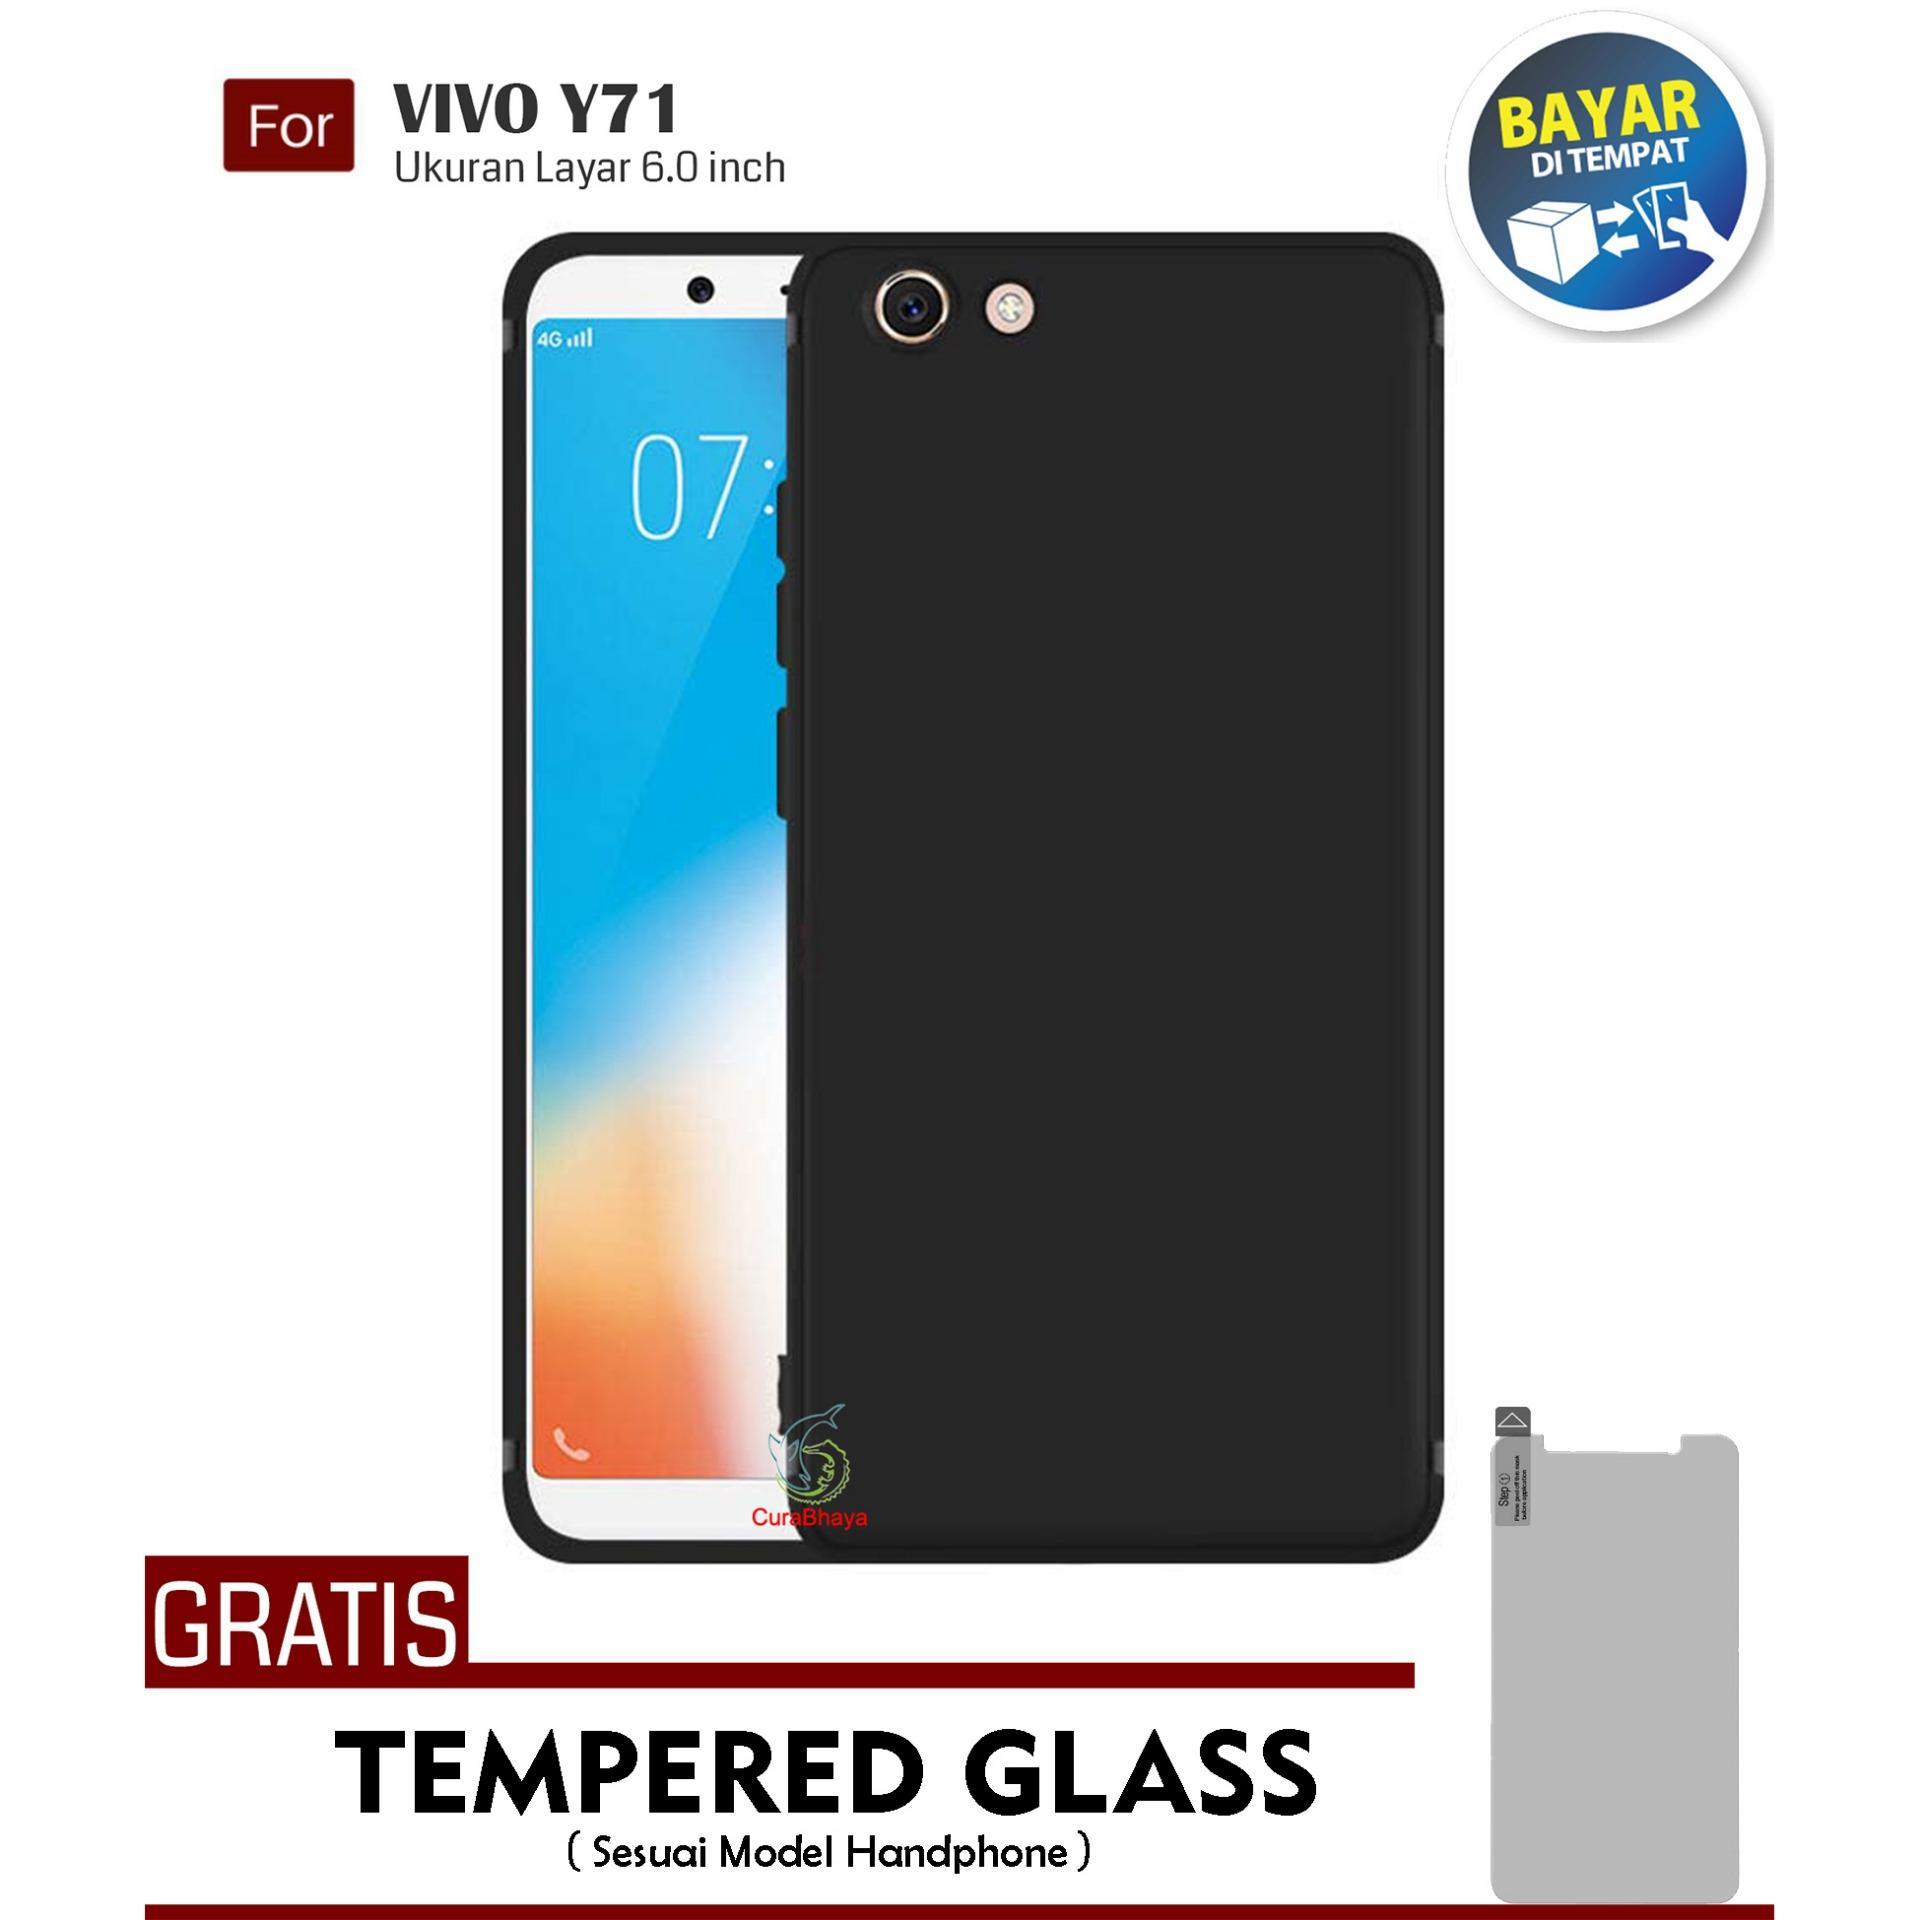 MidNight Vivo Y71 | Slim Case Black Matte Softcase Premium Baby Skin + Gratis Free Tempered